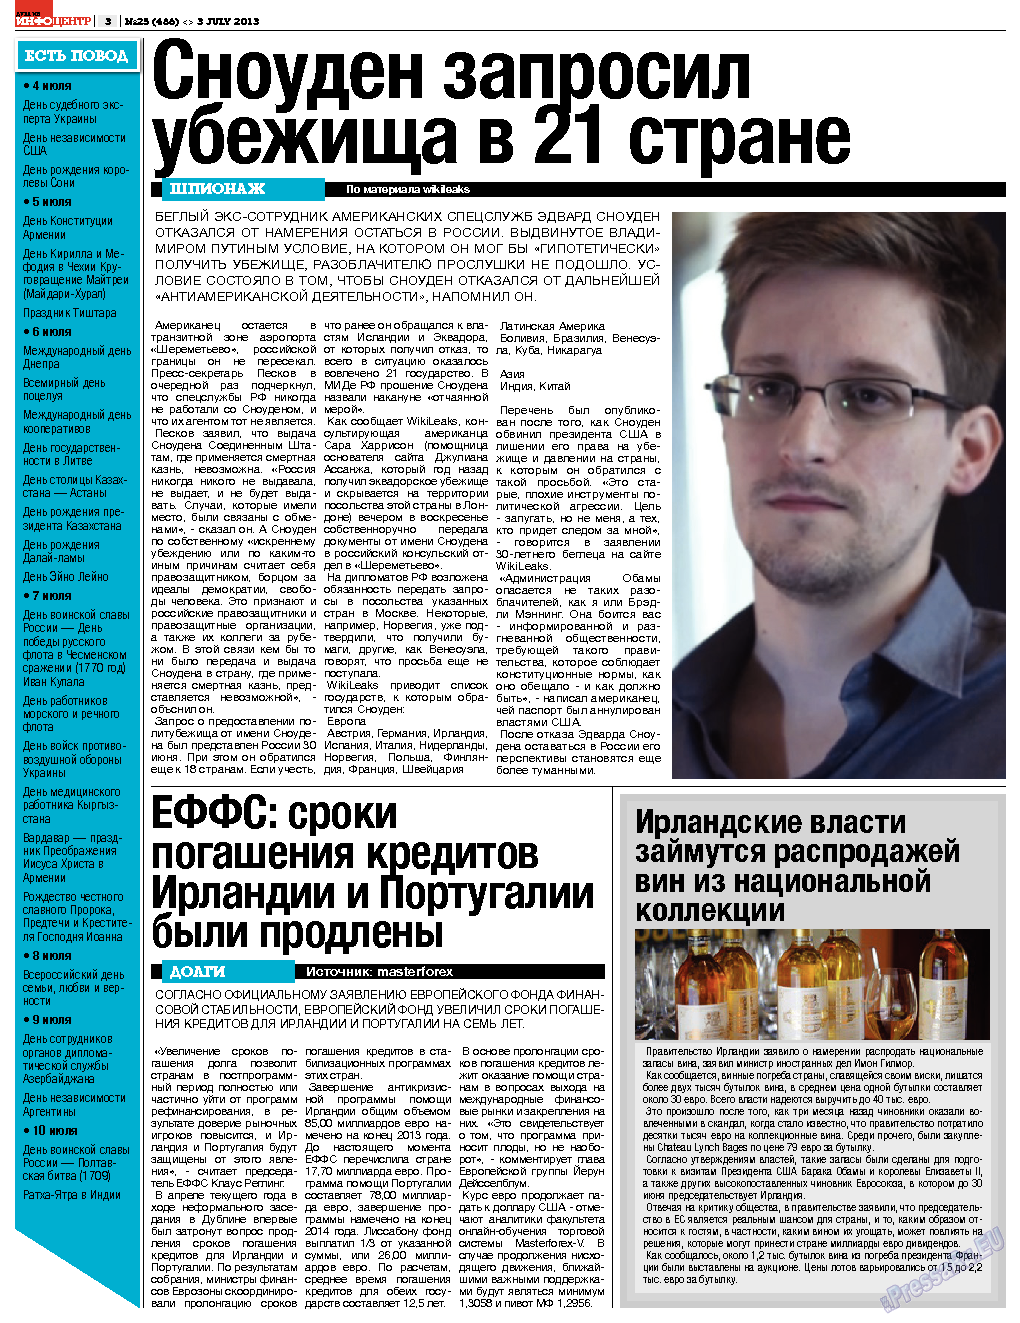 Дублин инфоцентр (газета). 2013 год, номер 25, стр. 3